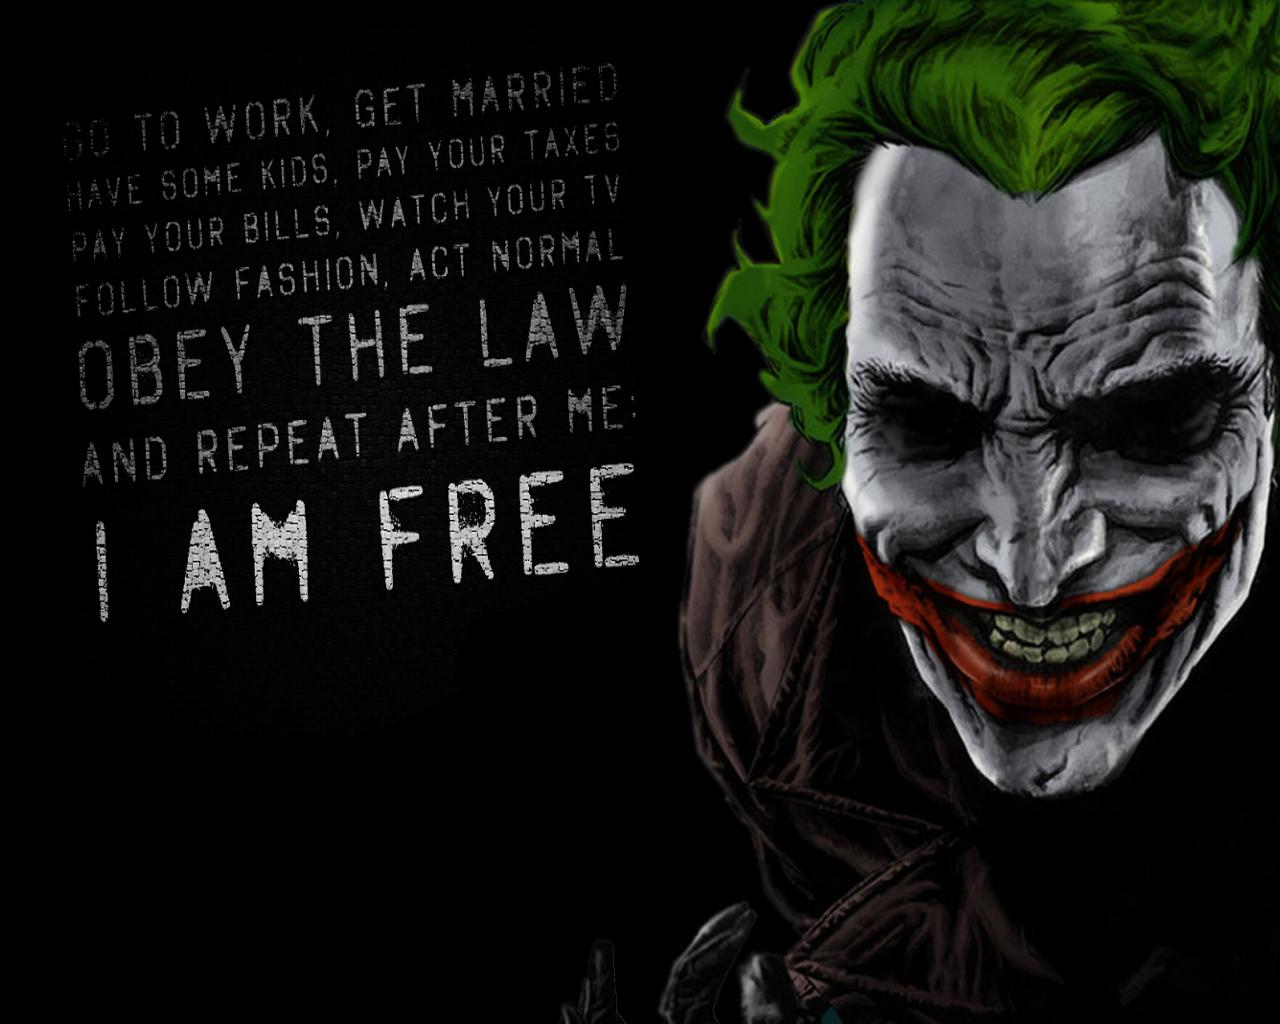 Joker Quotes Wallpapers - WallpaperSafari